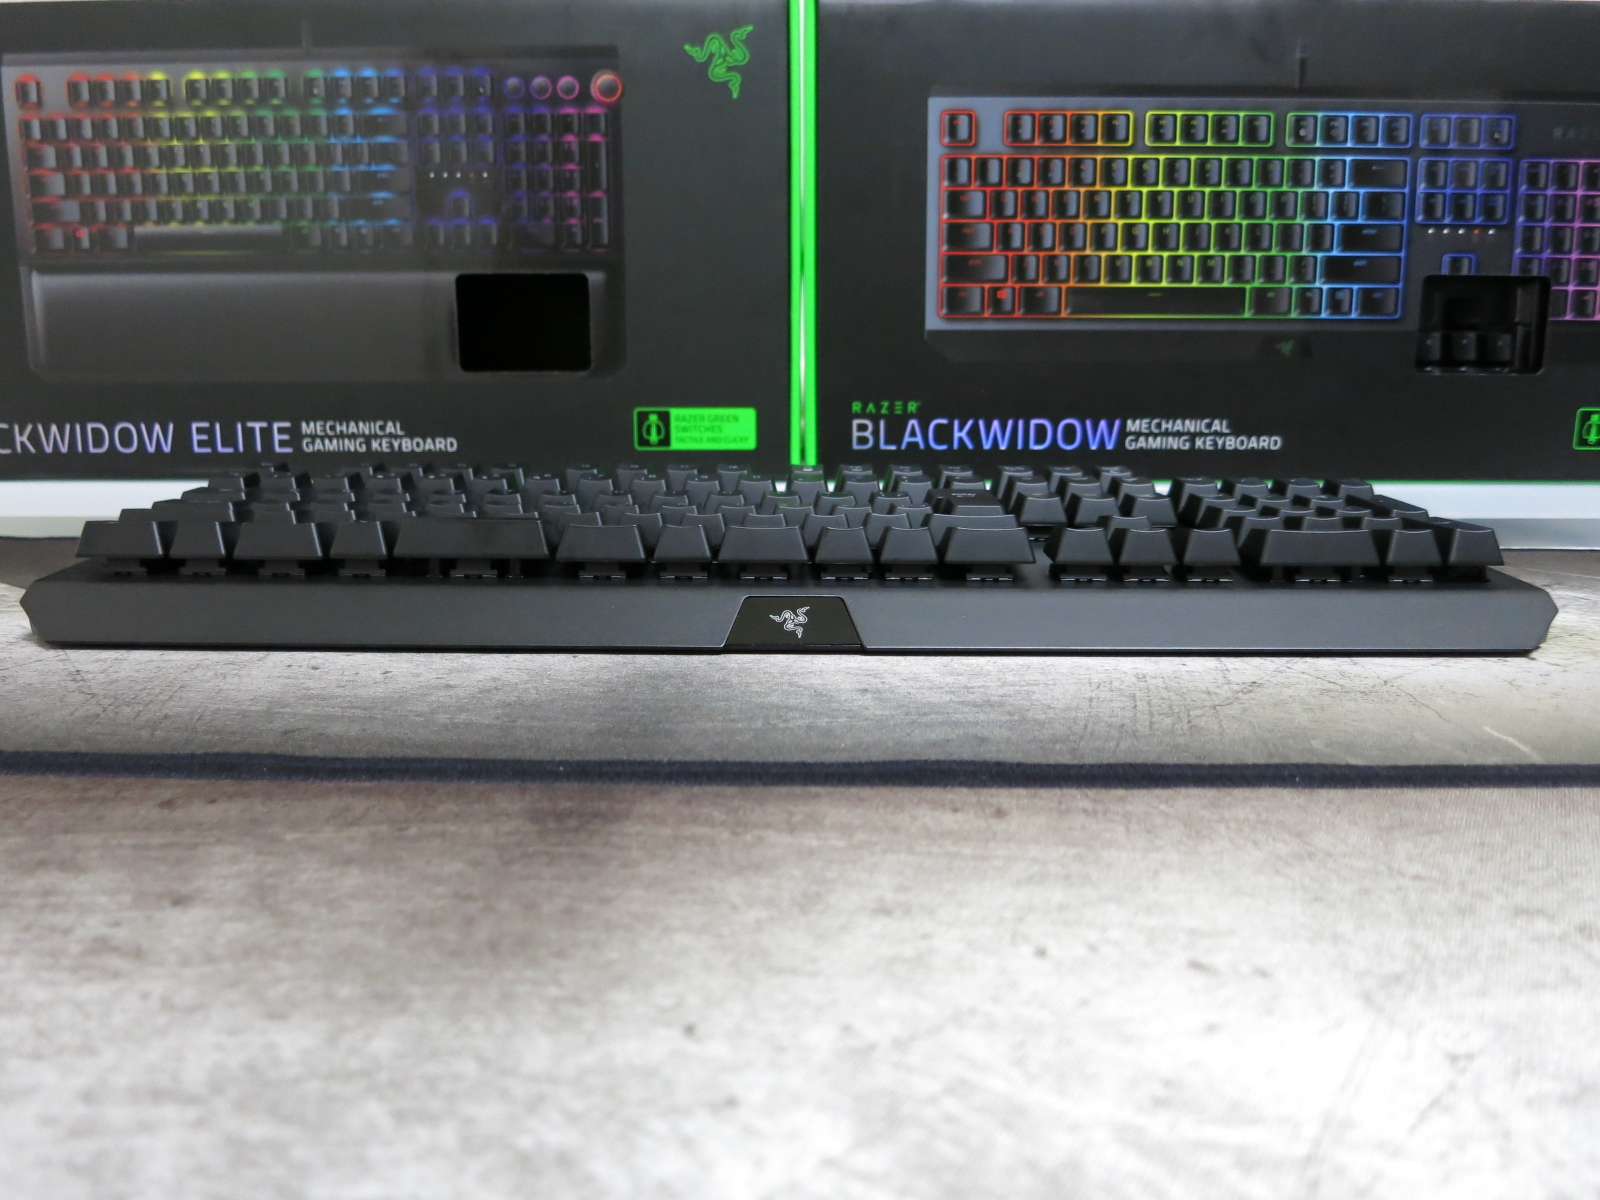 Razer_BlackWidow_Elite_Review_08.jpg